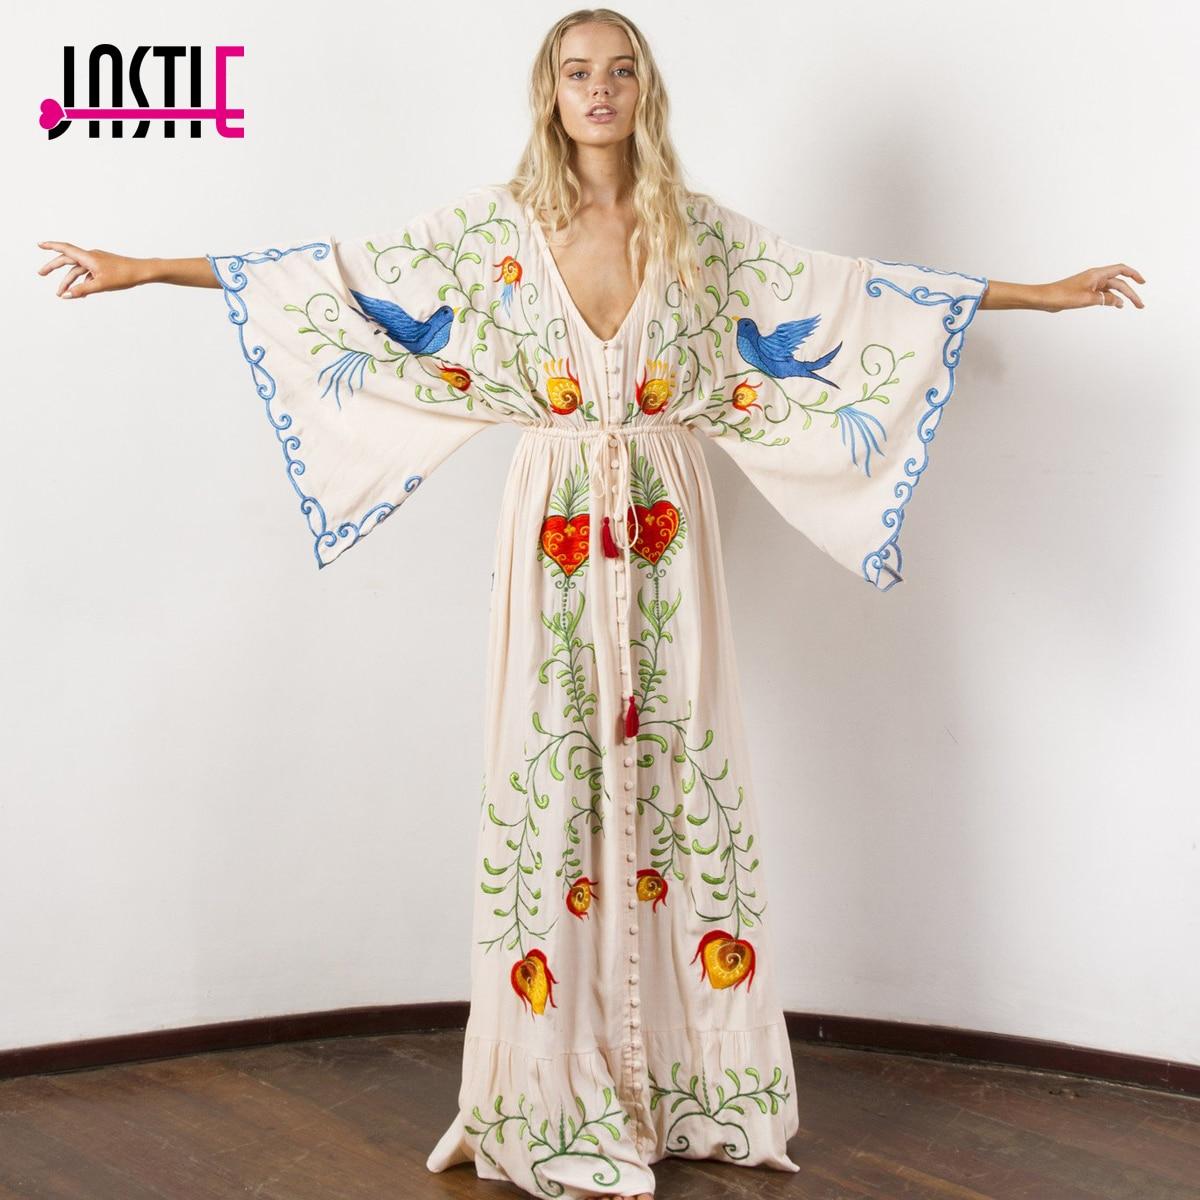 c855d646e31a0 US $47.43 31% OFF Jastie Embroidered Women Maxi Dress V Neck Batwing Sleeve  Loose Plus Size Summer Dresses Drawstring Waist Boho Beach Vestidos-in ...